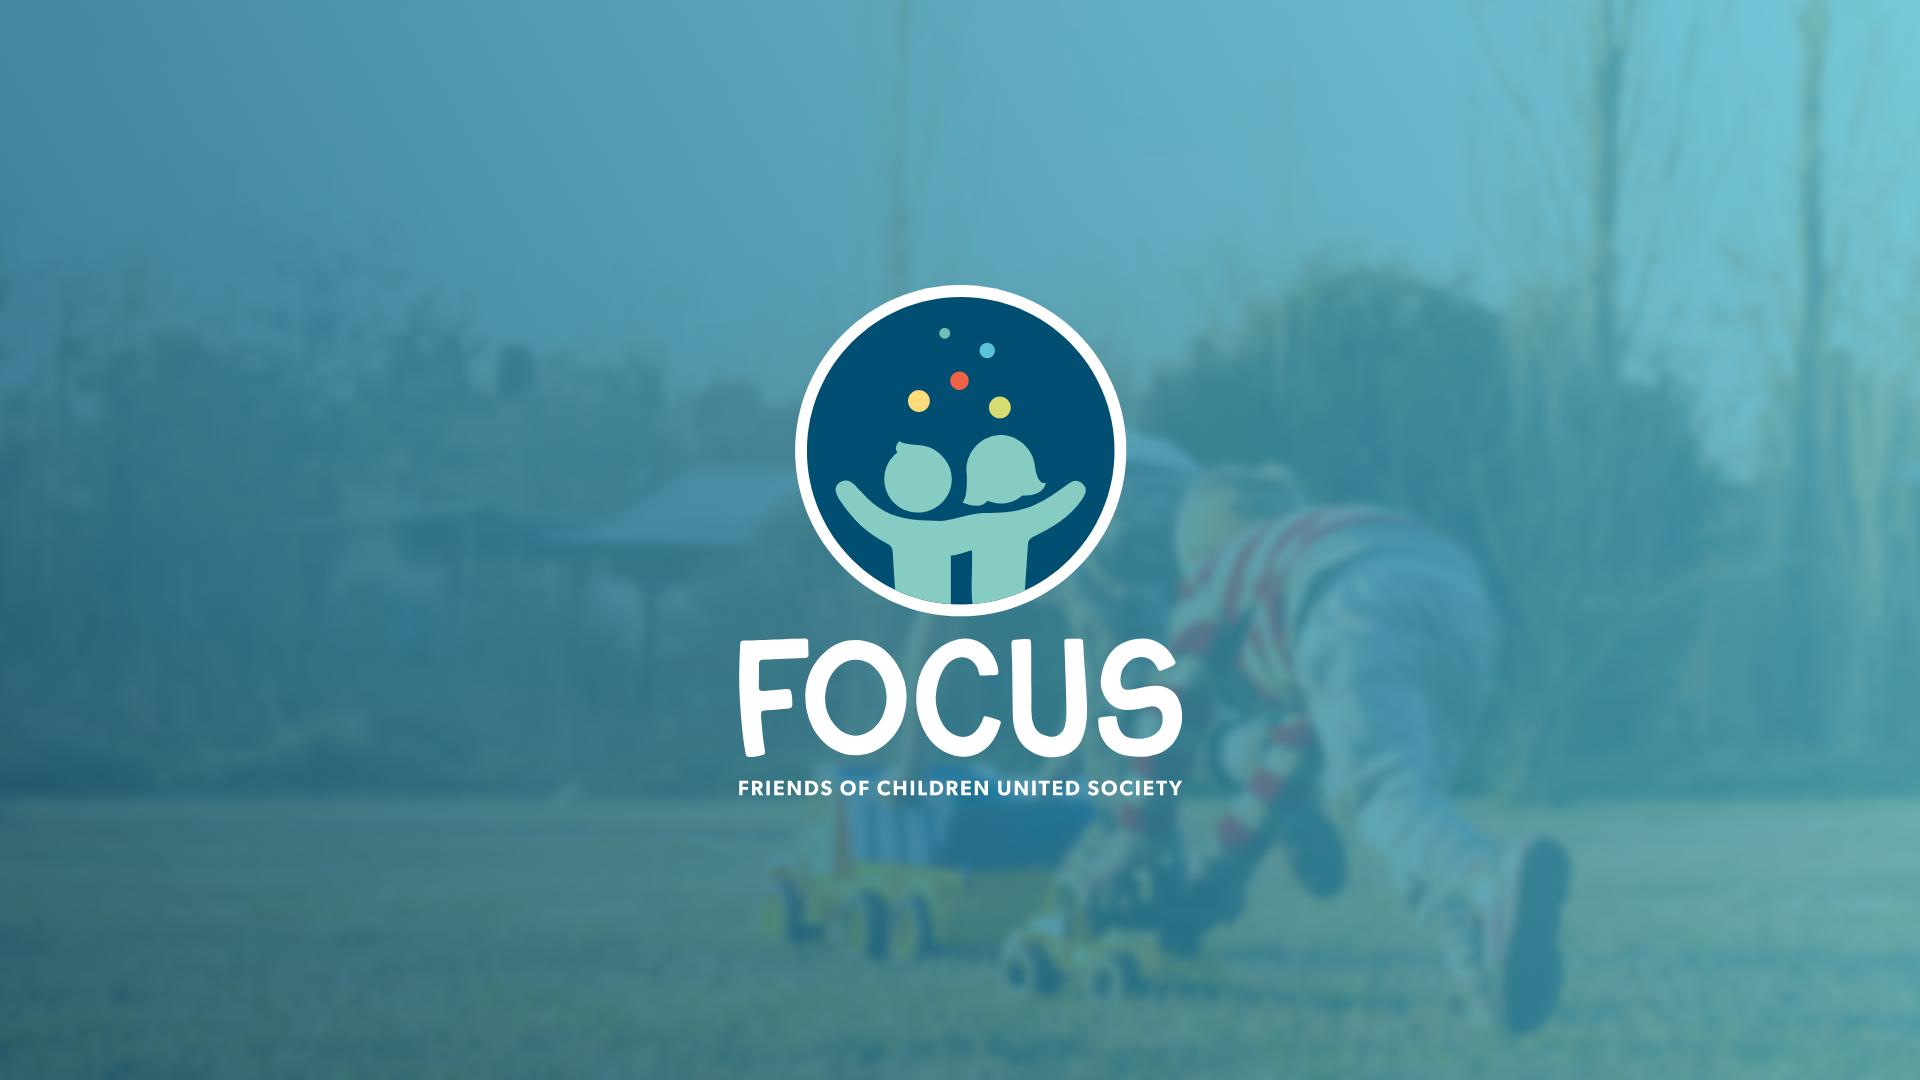 focus-placeholder-1920-1080